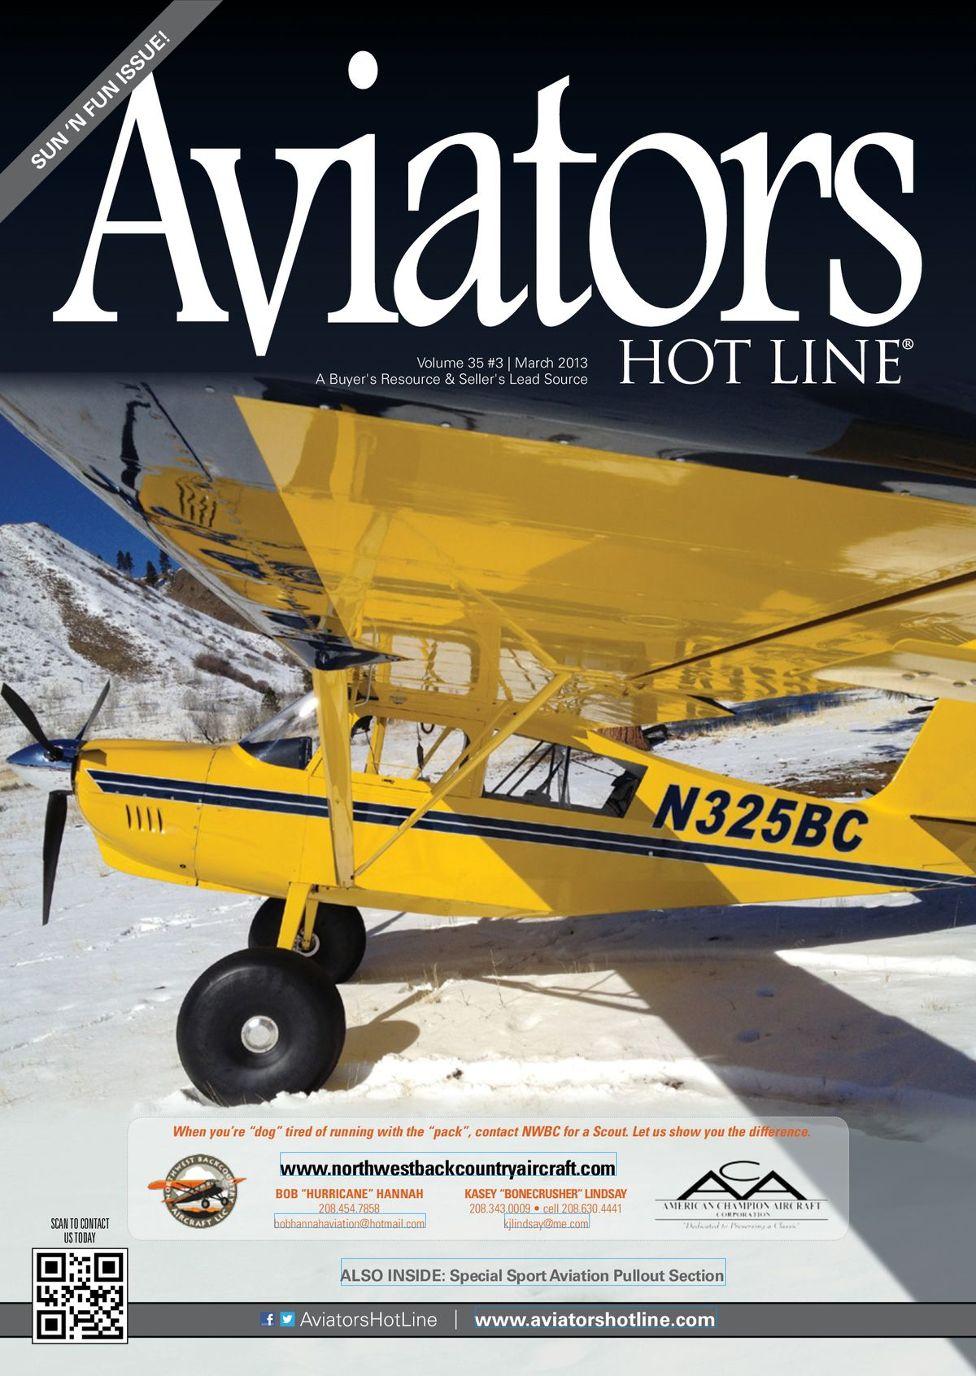 Aviators Hot Line - March 2013